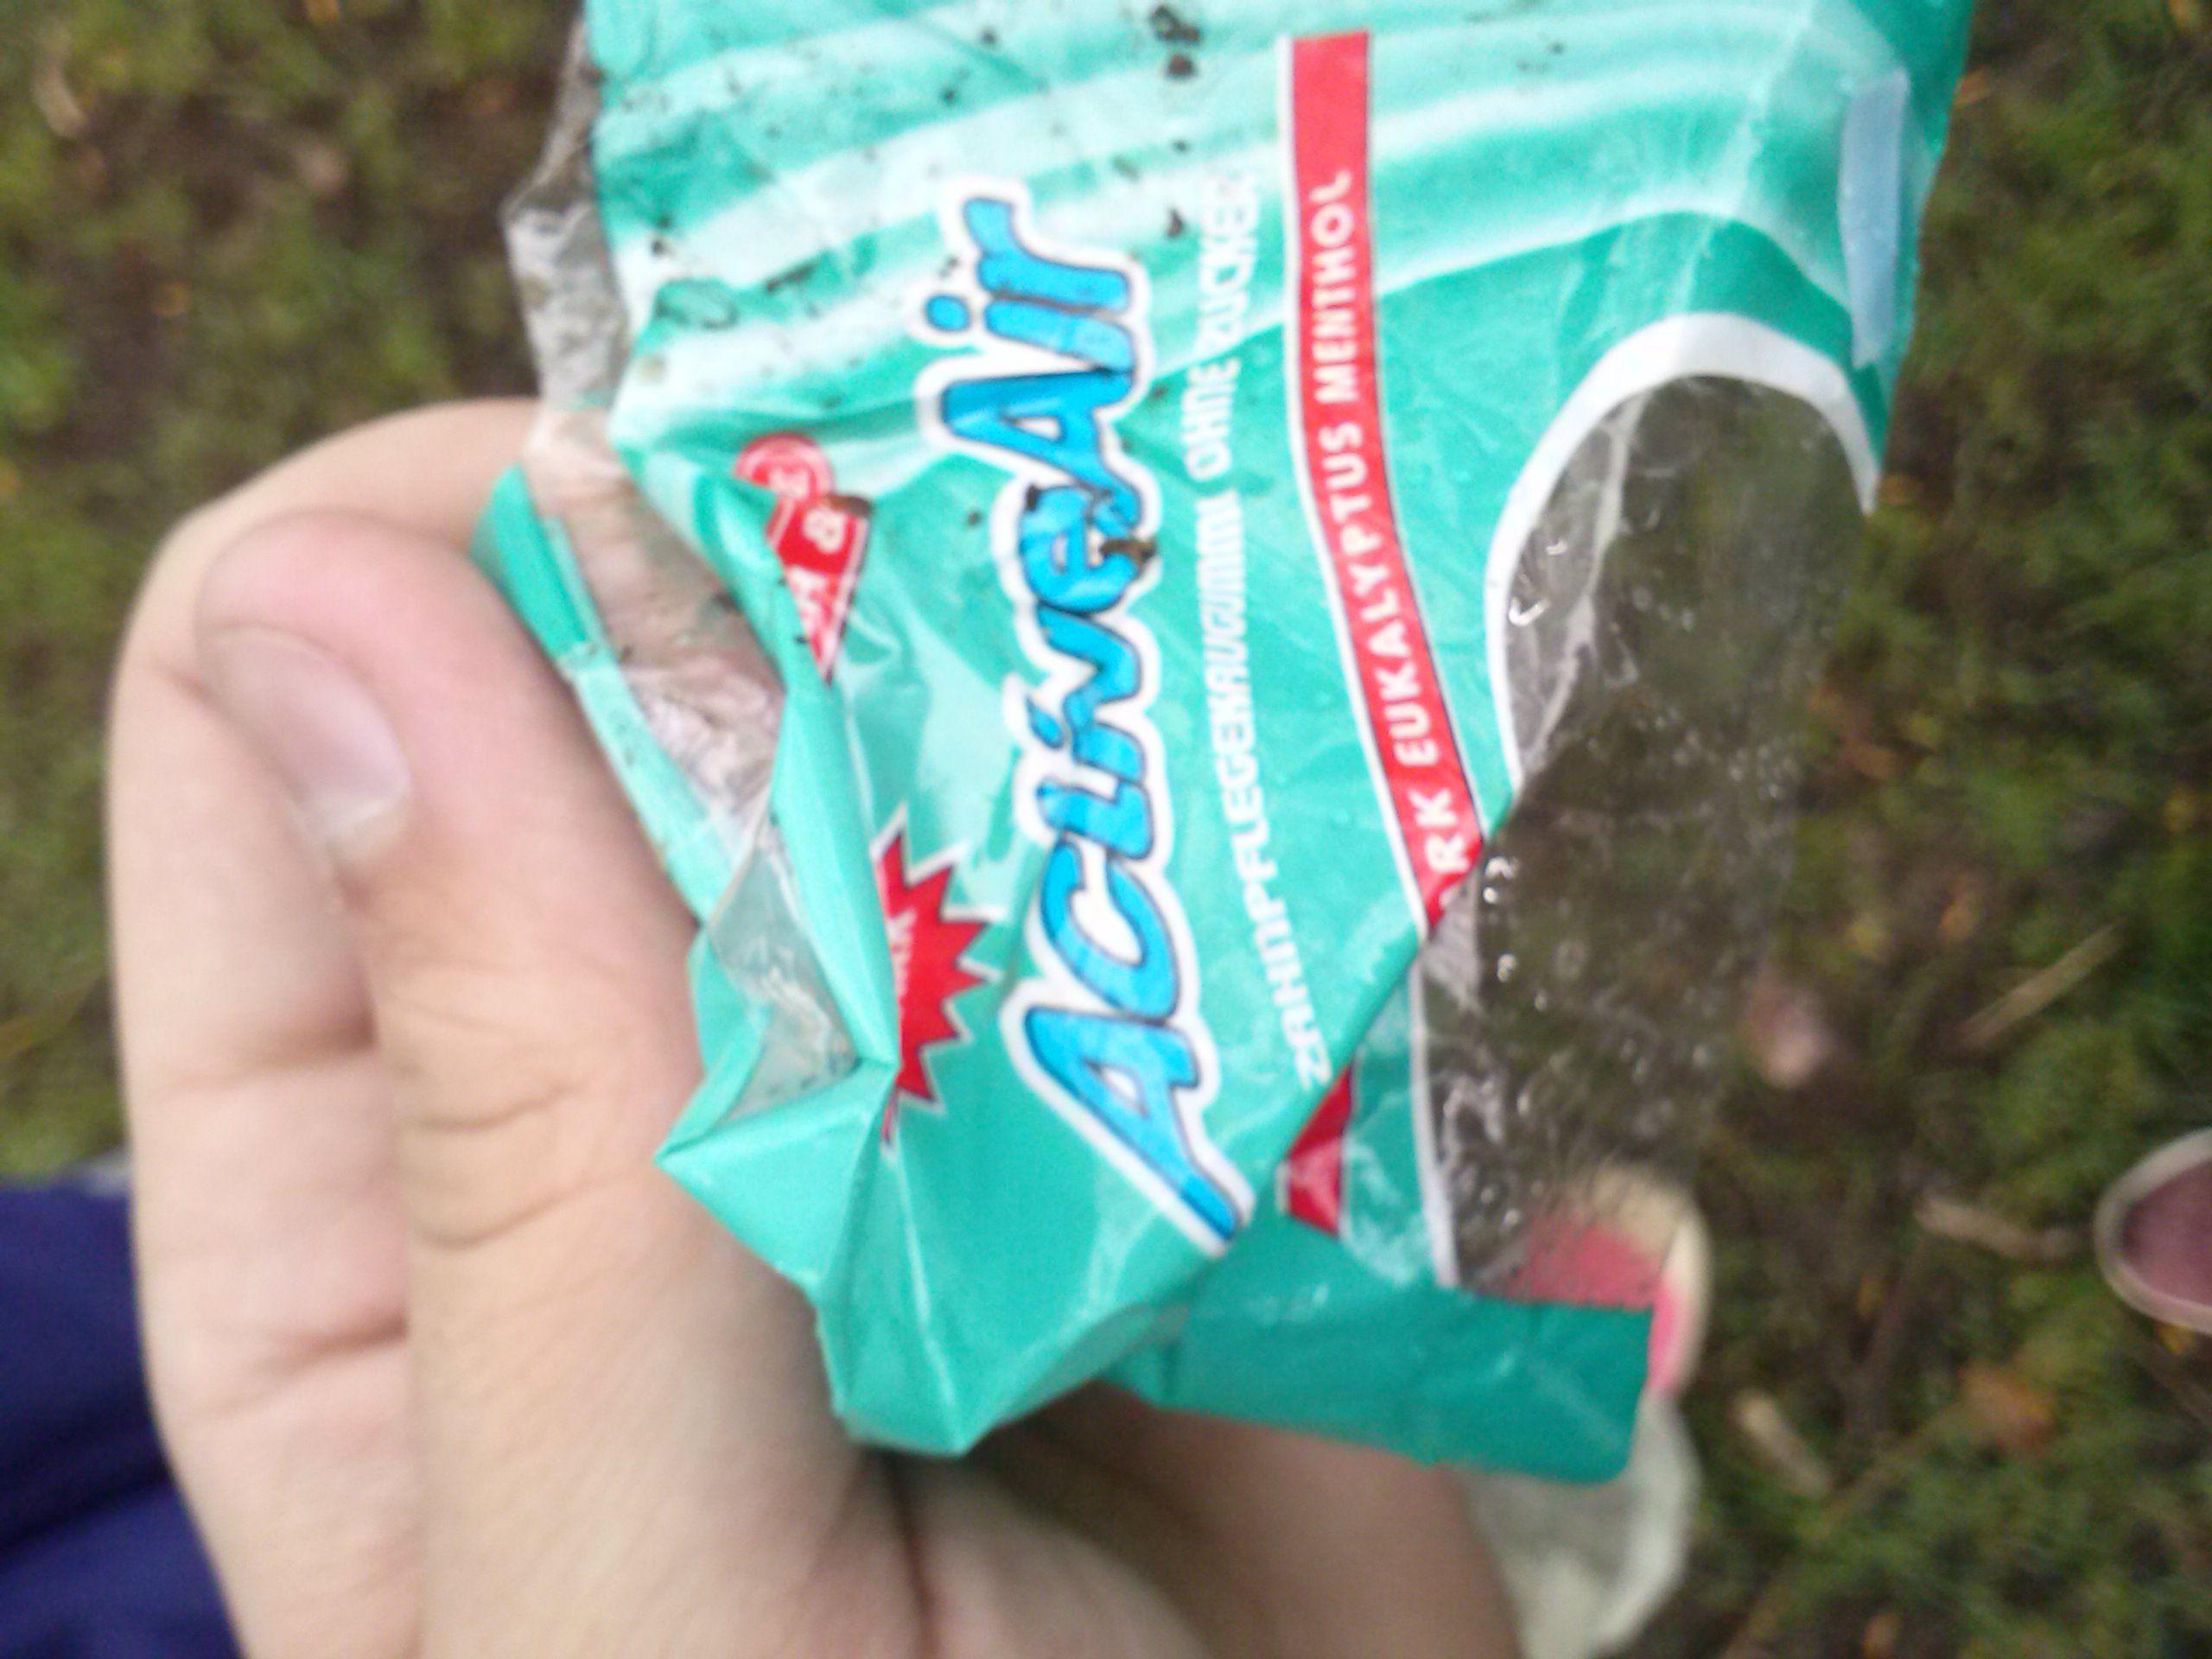 kauwgomverpakking